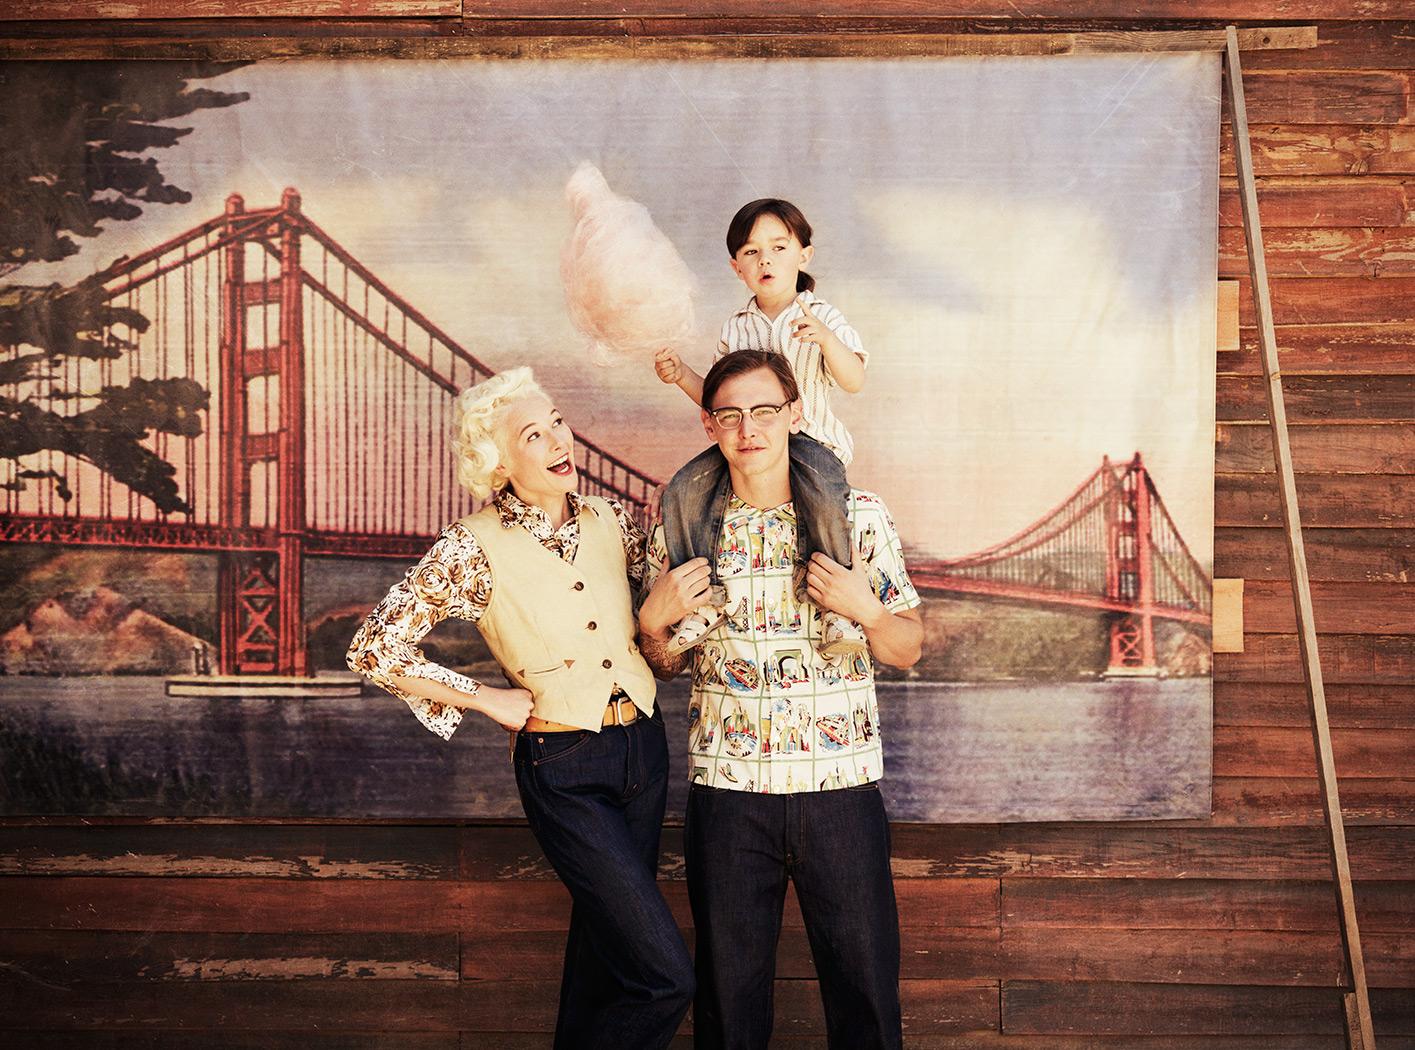 Levi's-Vintage-Clothing-Summer-2014-03